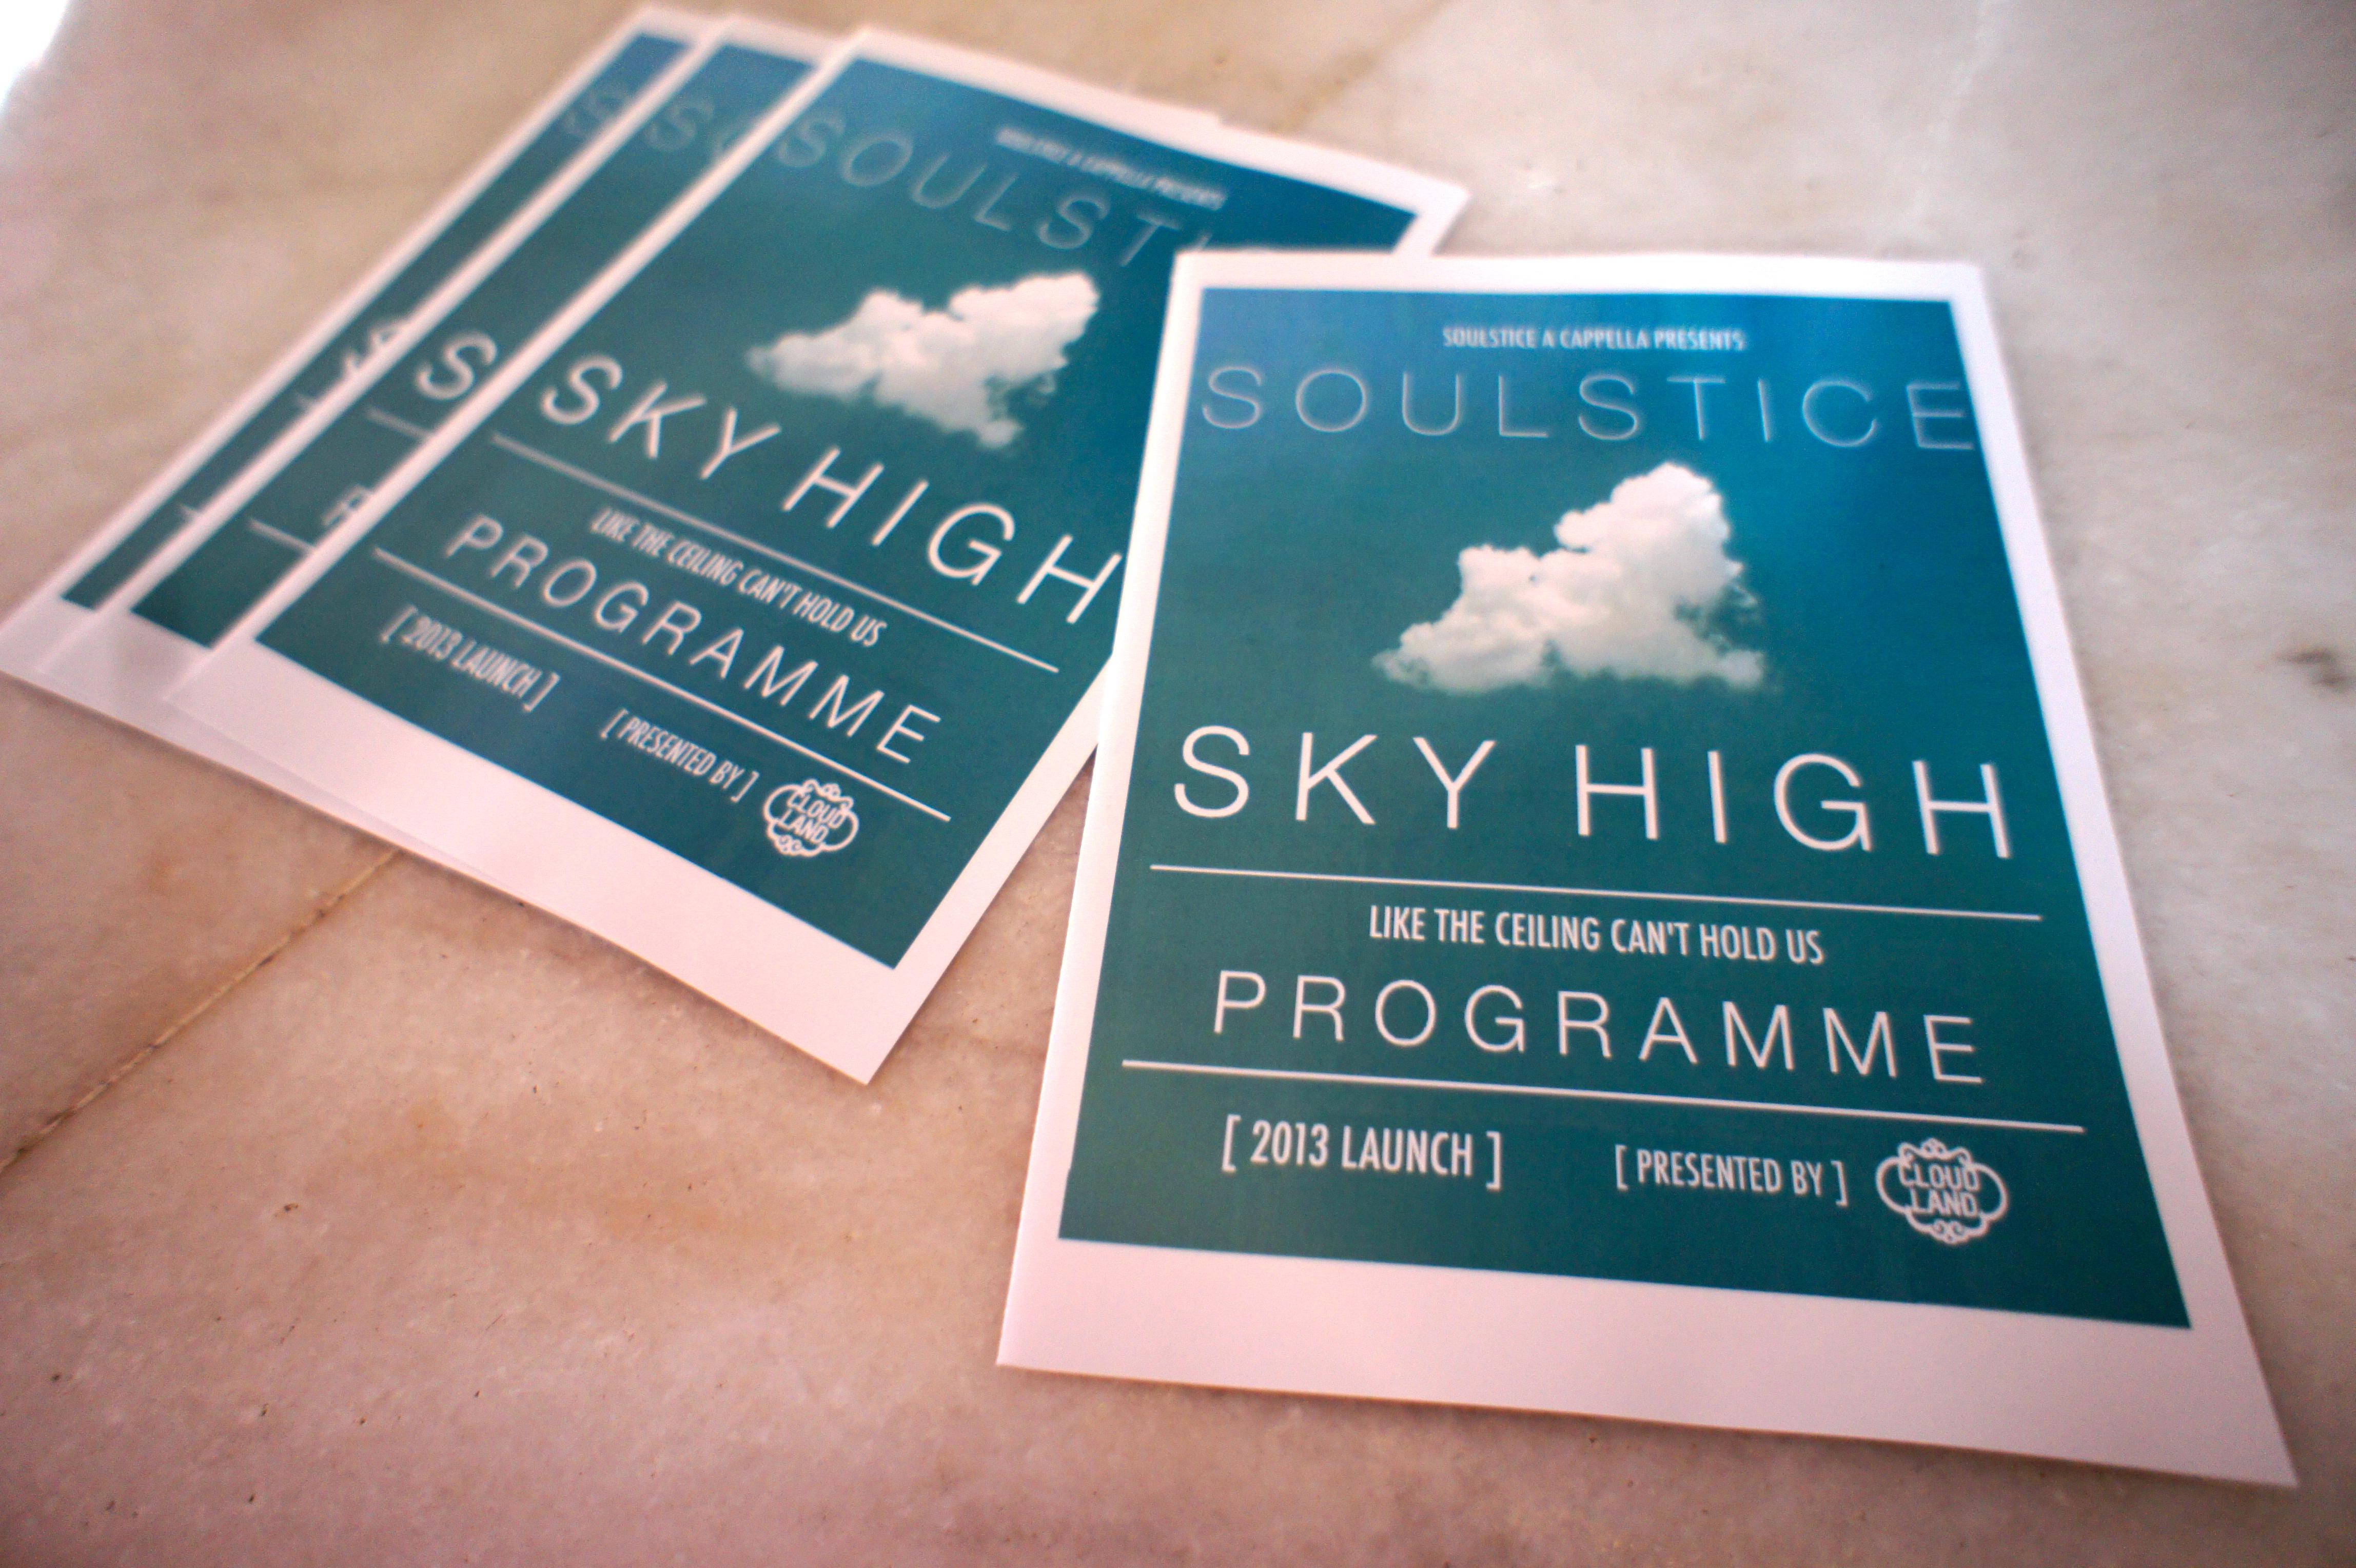 Soulstice Programme